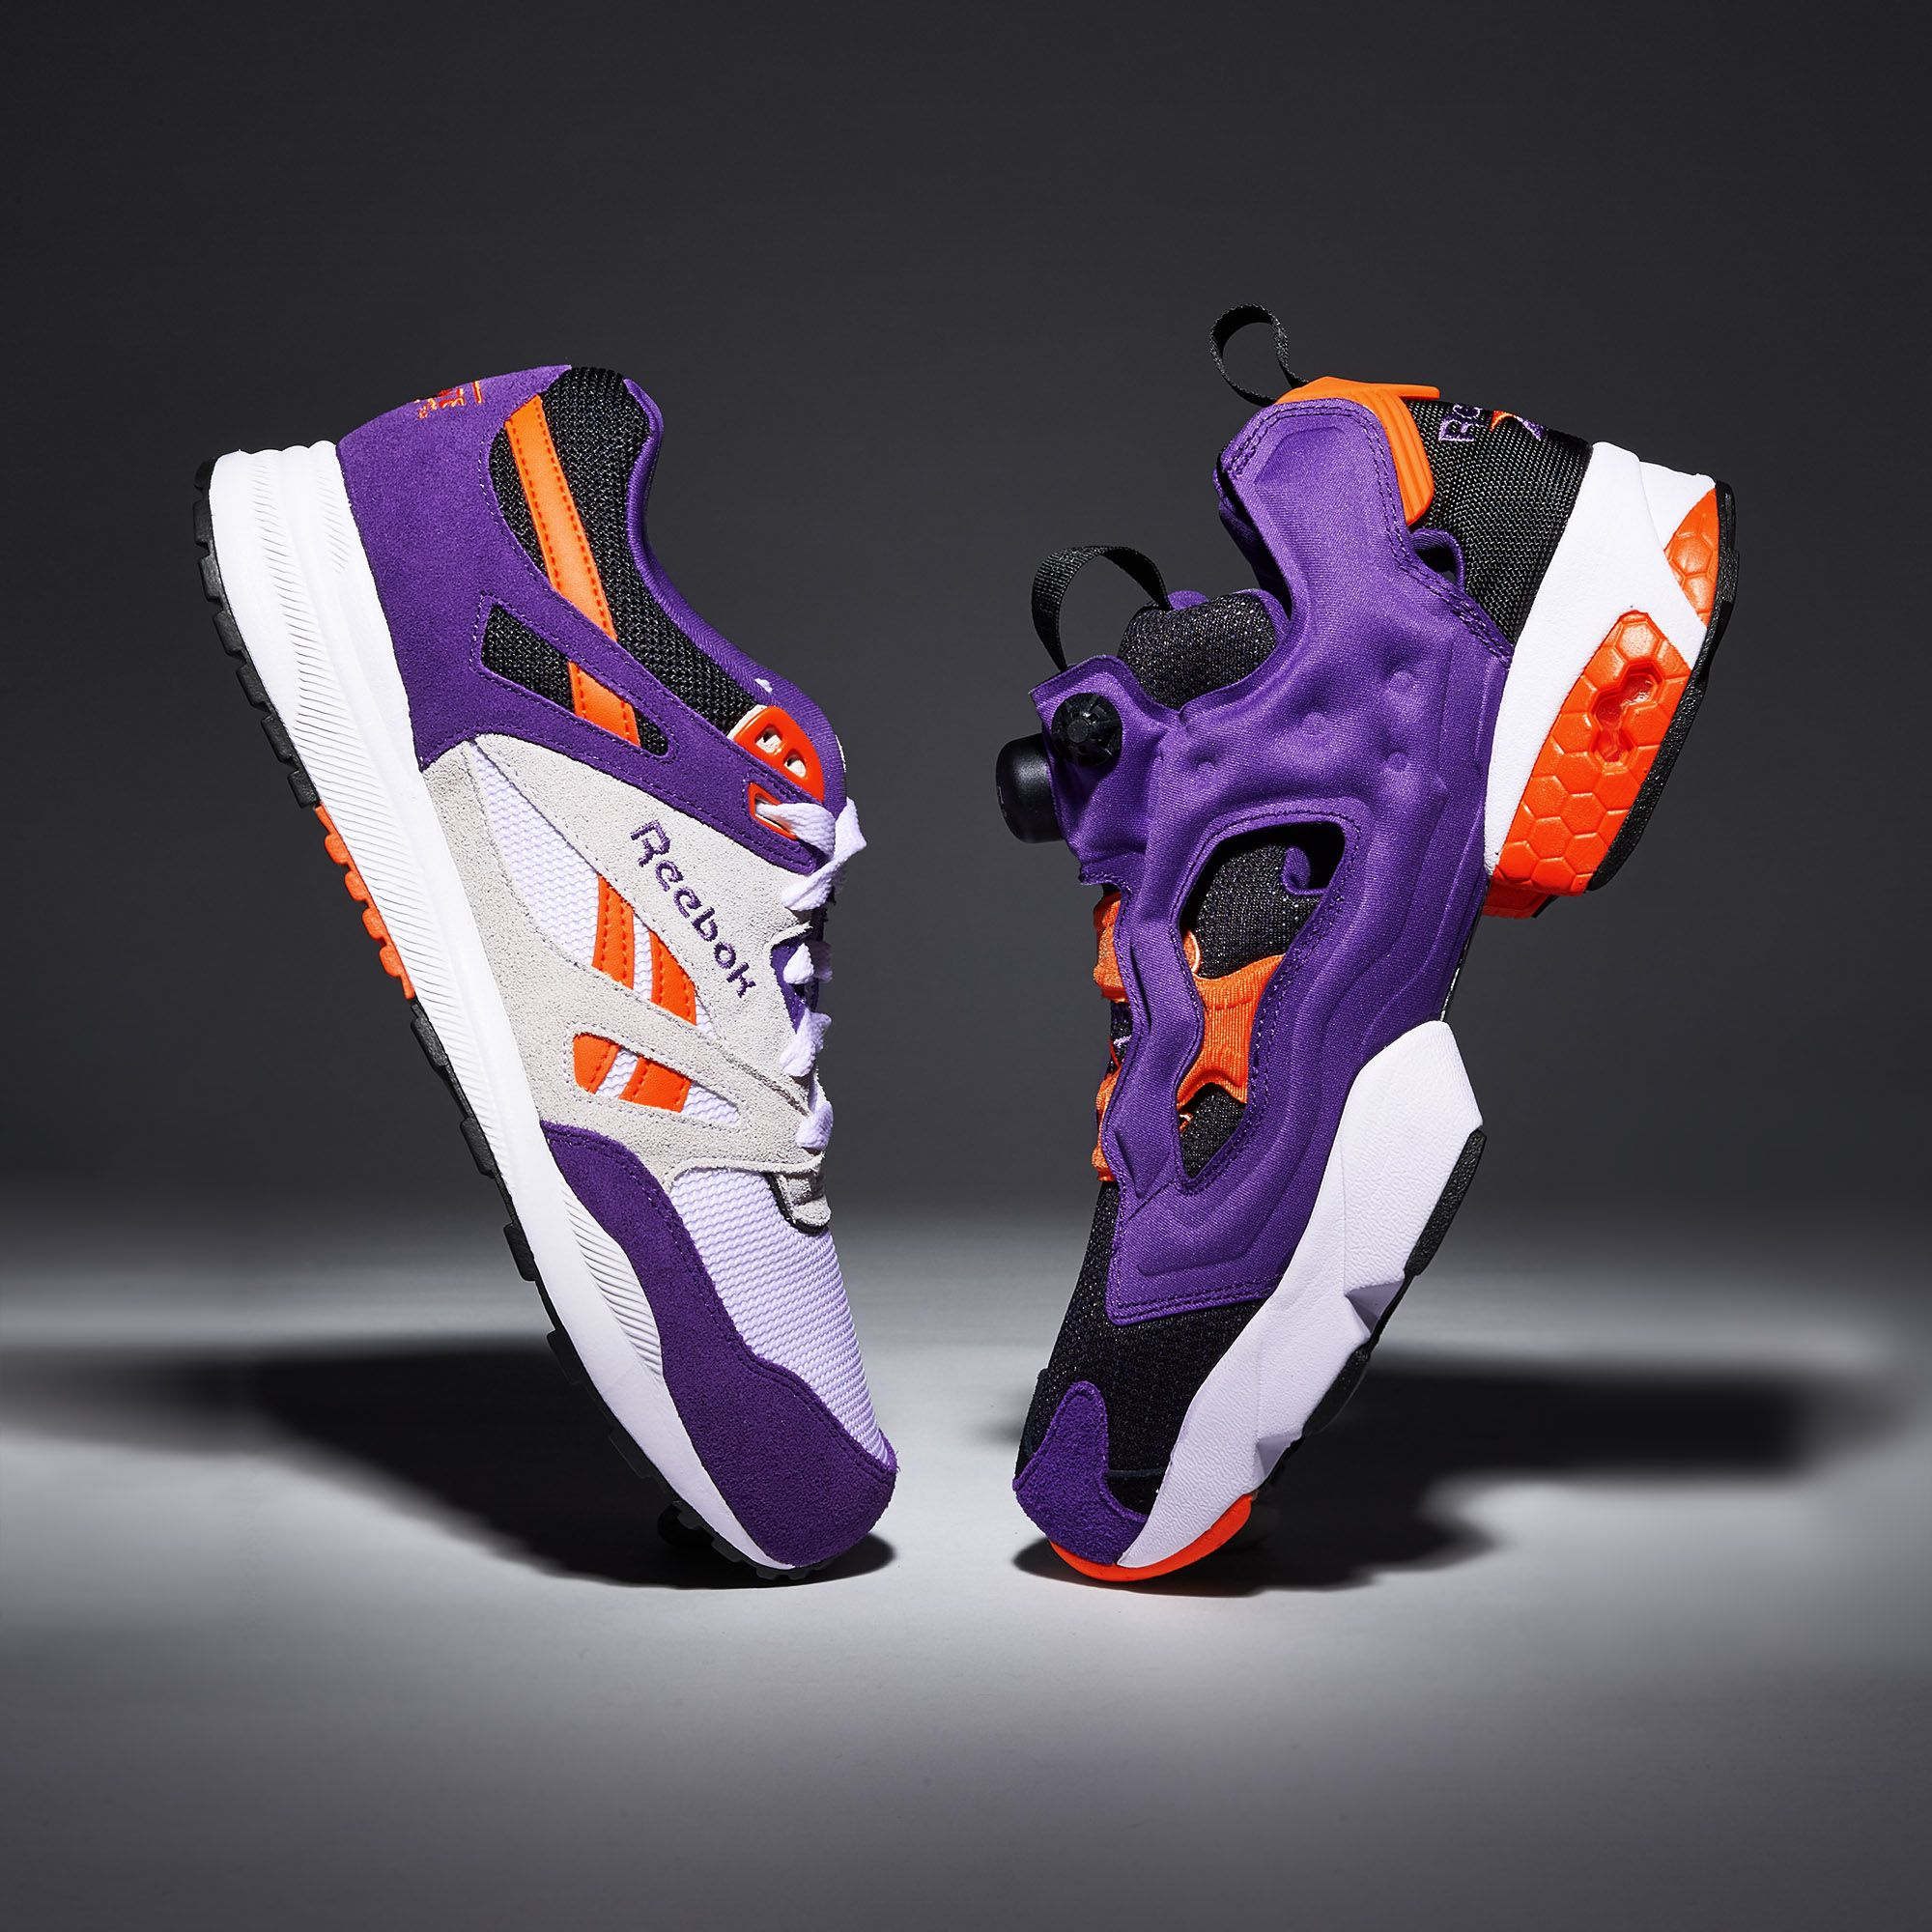 a1eb281a878be Reebok Ventilator vs. Reebok Instapump Fury | Sneaker Love ...